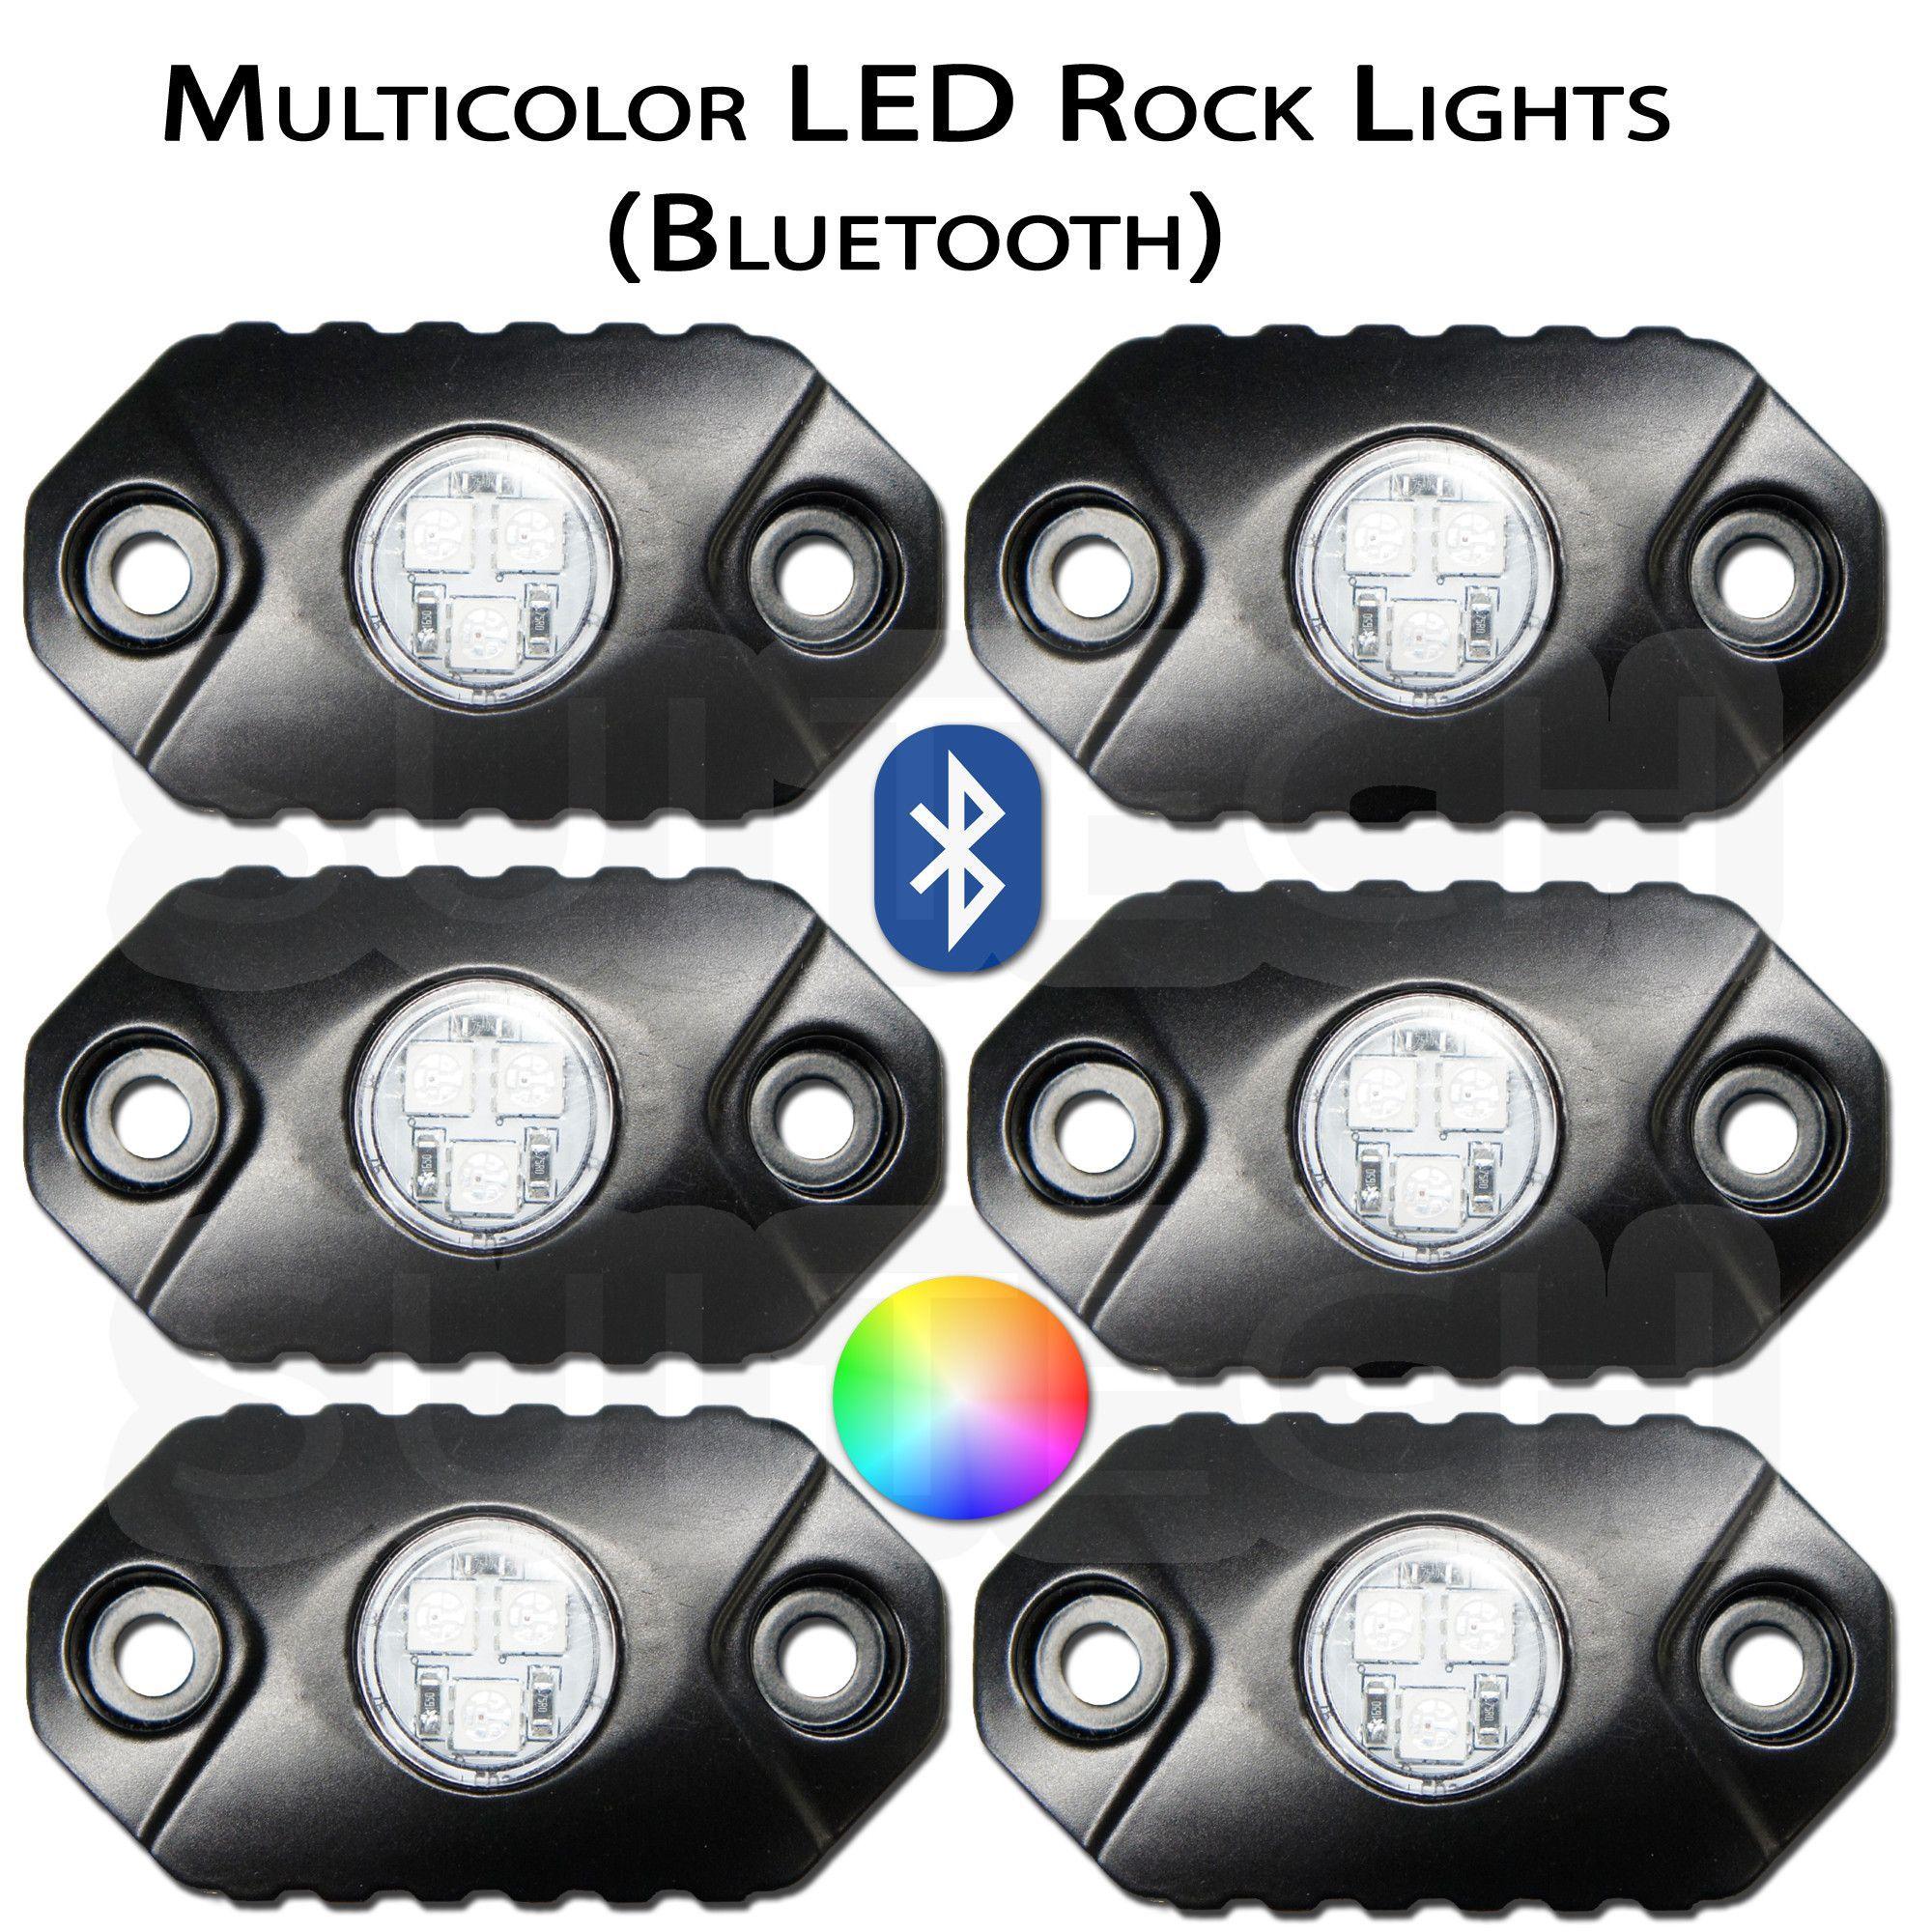 Multicolor Sui Rocks Worlds Toughest LED Rock Lights Looking